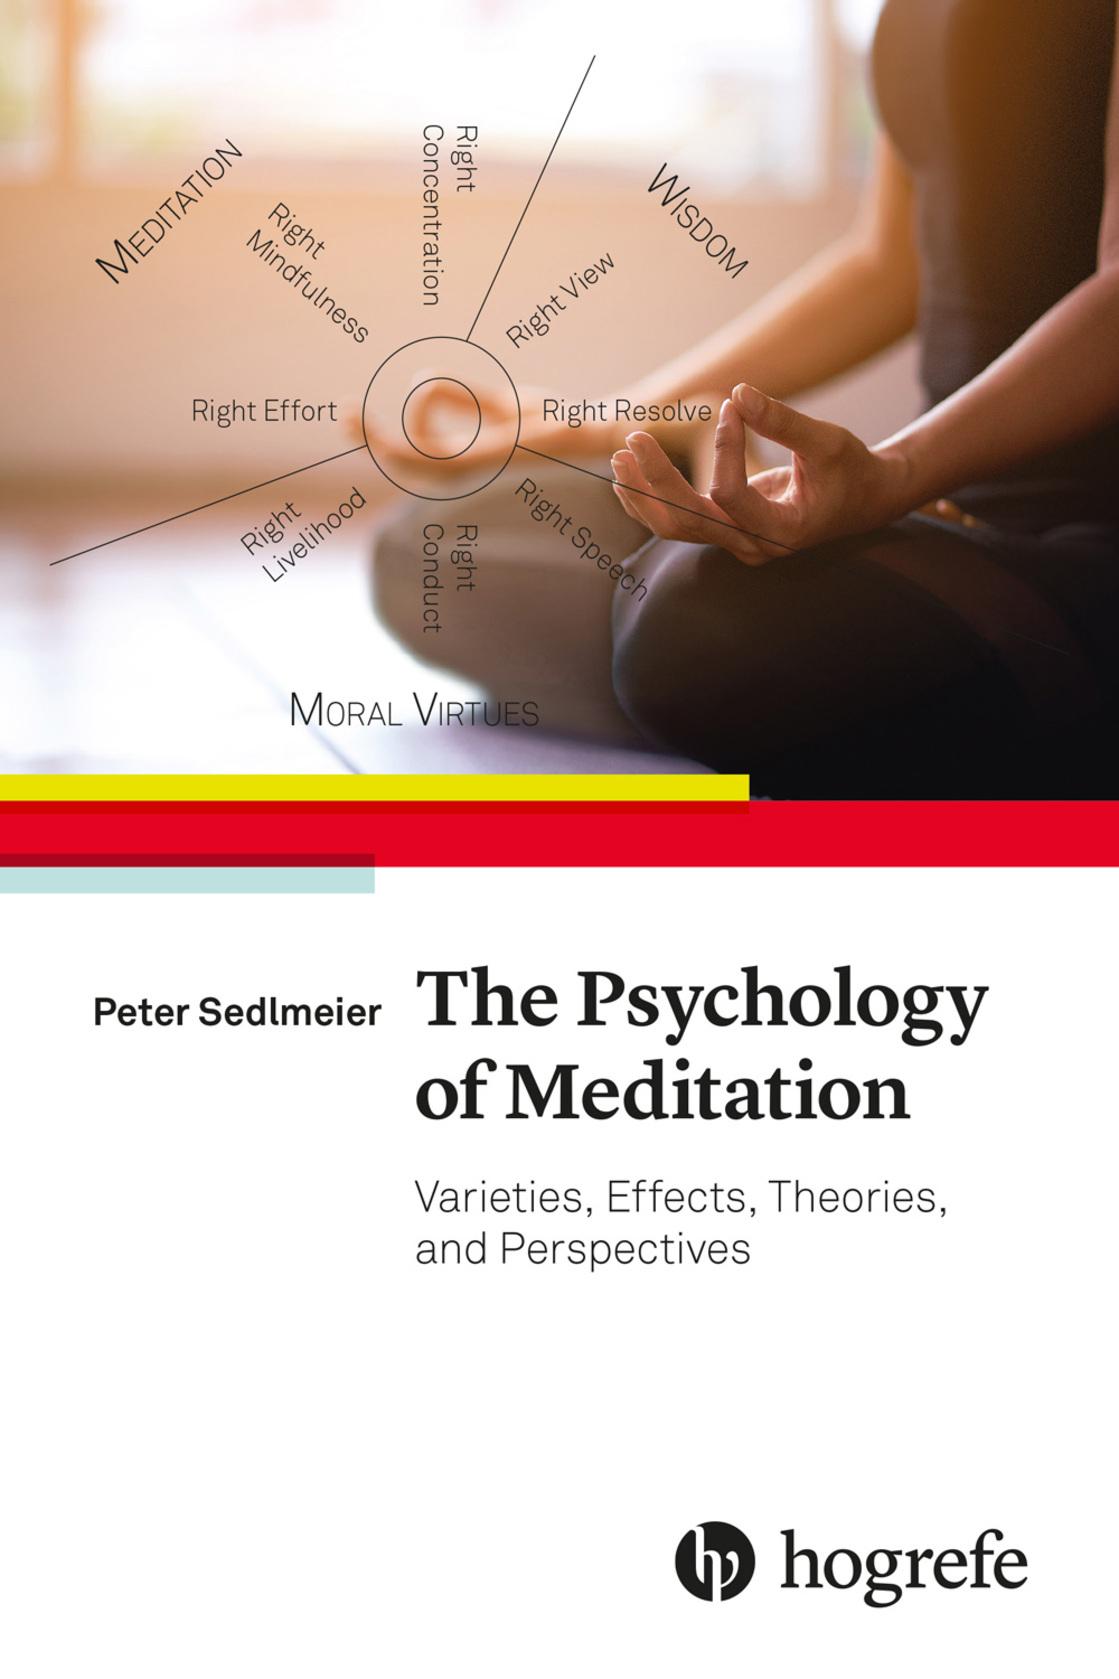 The Psychology of Meditation